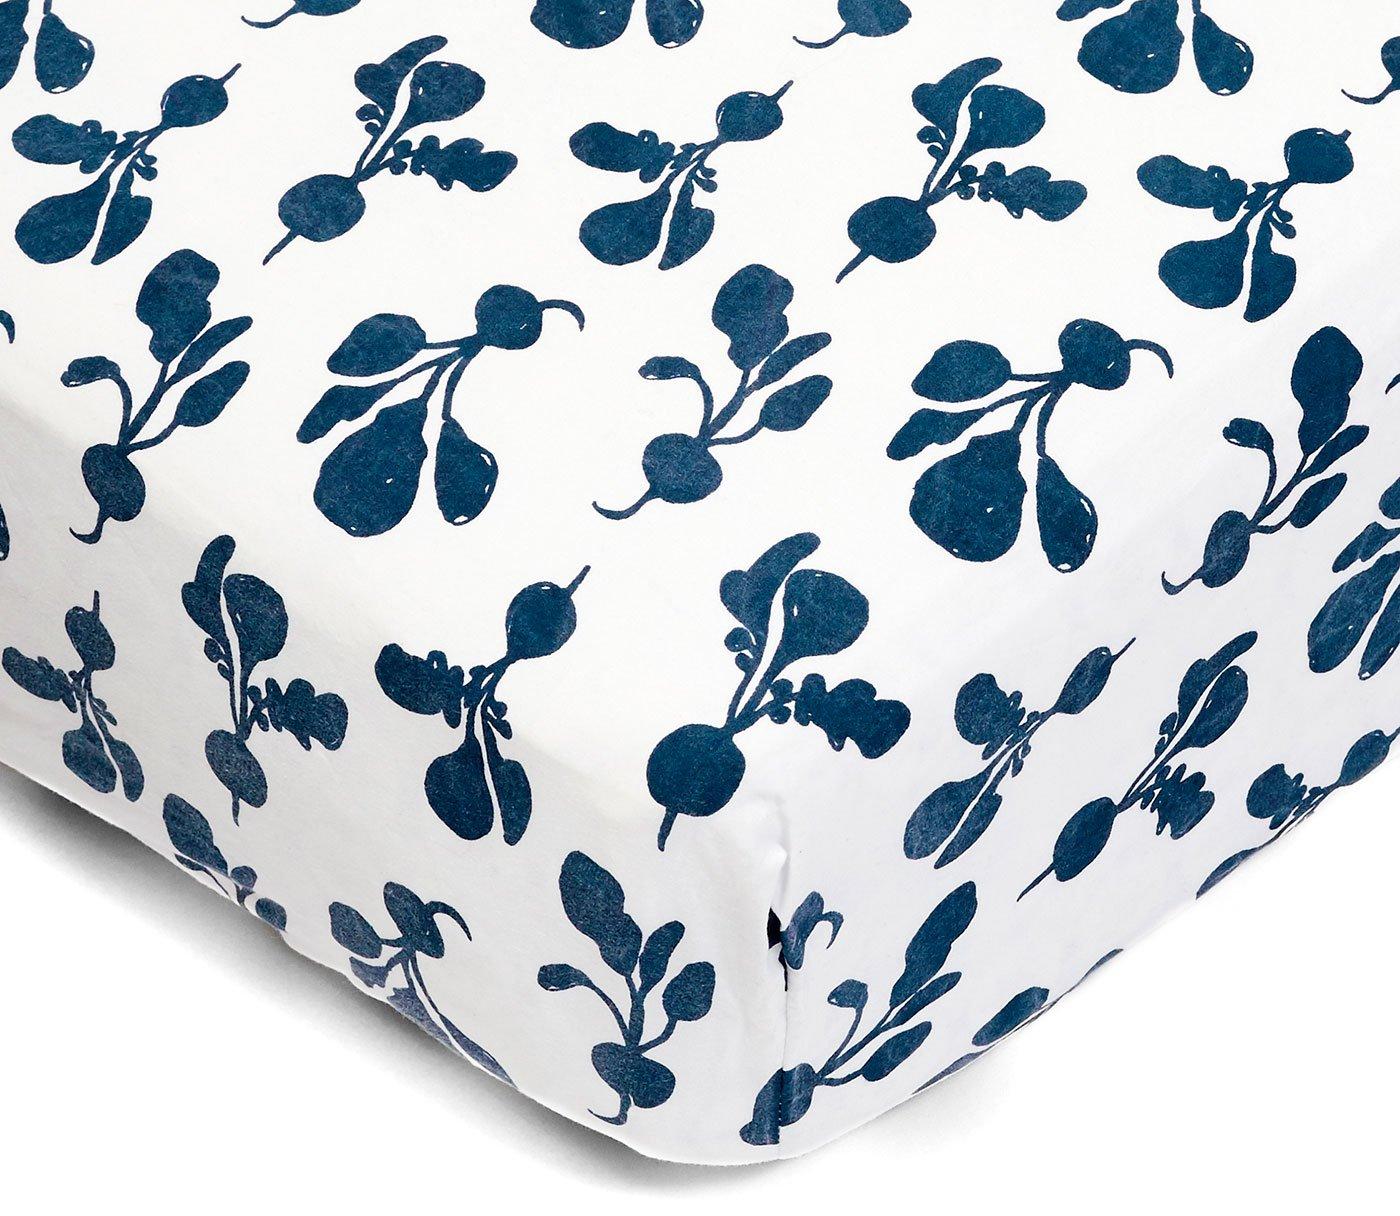 Lewis Organic Cotton Fitted Crib Sheet Radish Print 100% Organic Cotton Percale, Denim